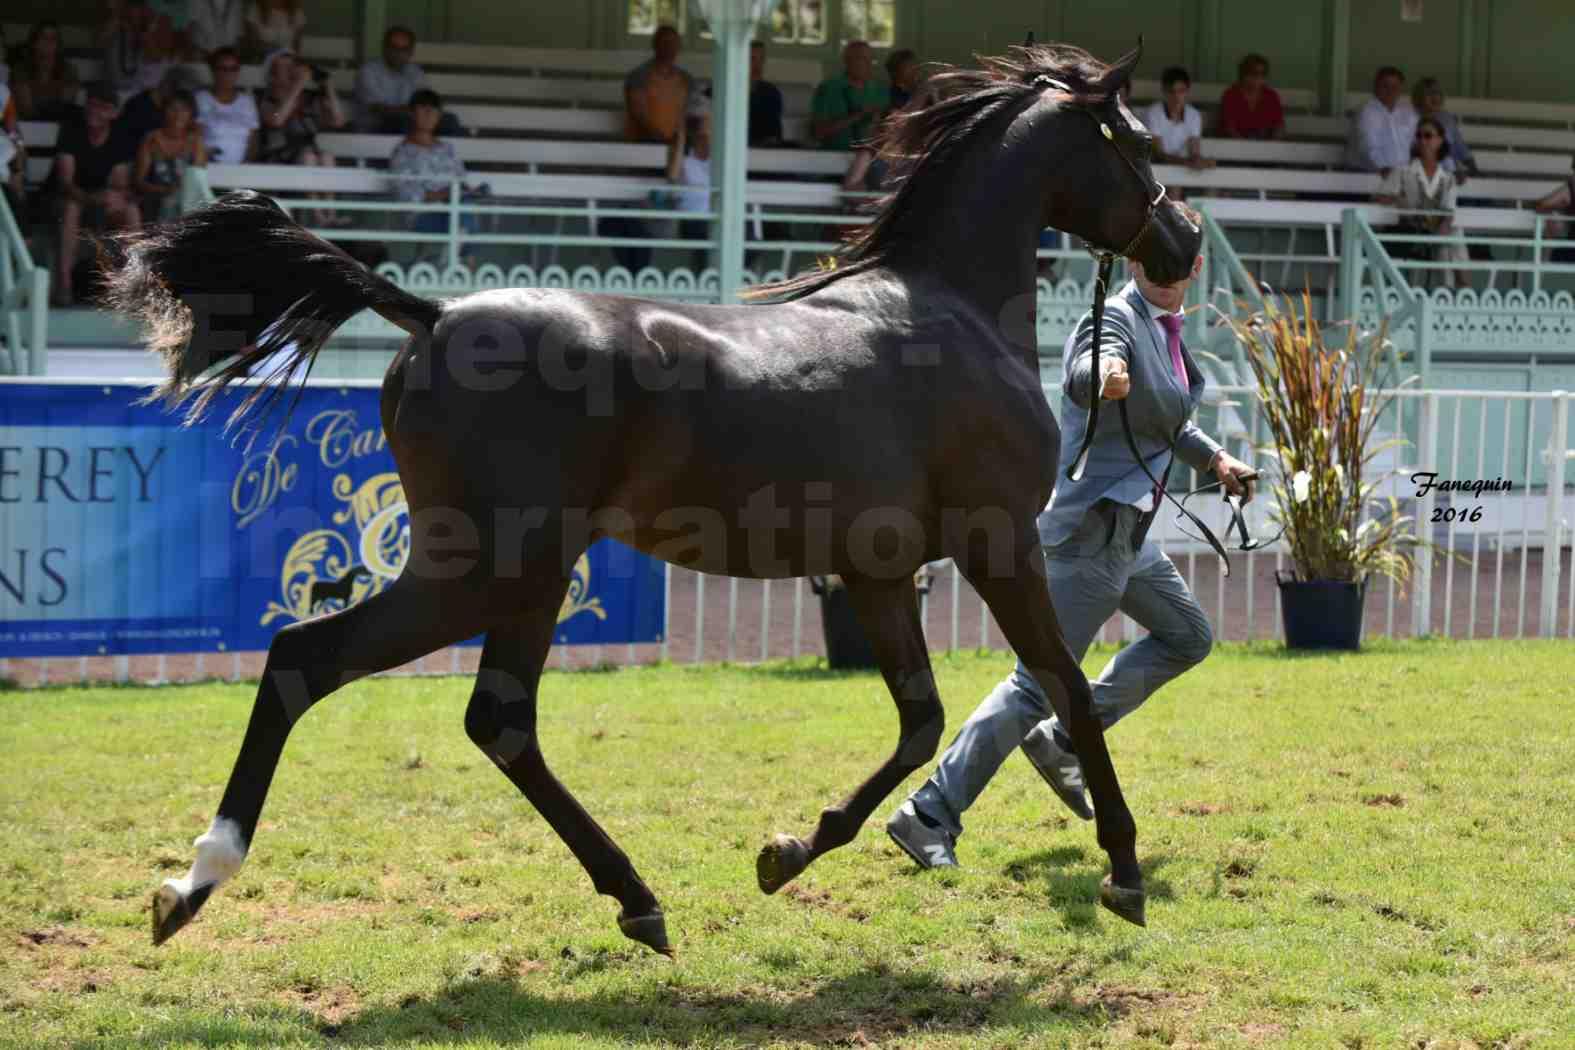 International Arabian Horse Show B de VICHY 2016 - ANNALISA ALIH - Notre Sélection - 5